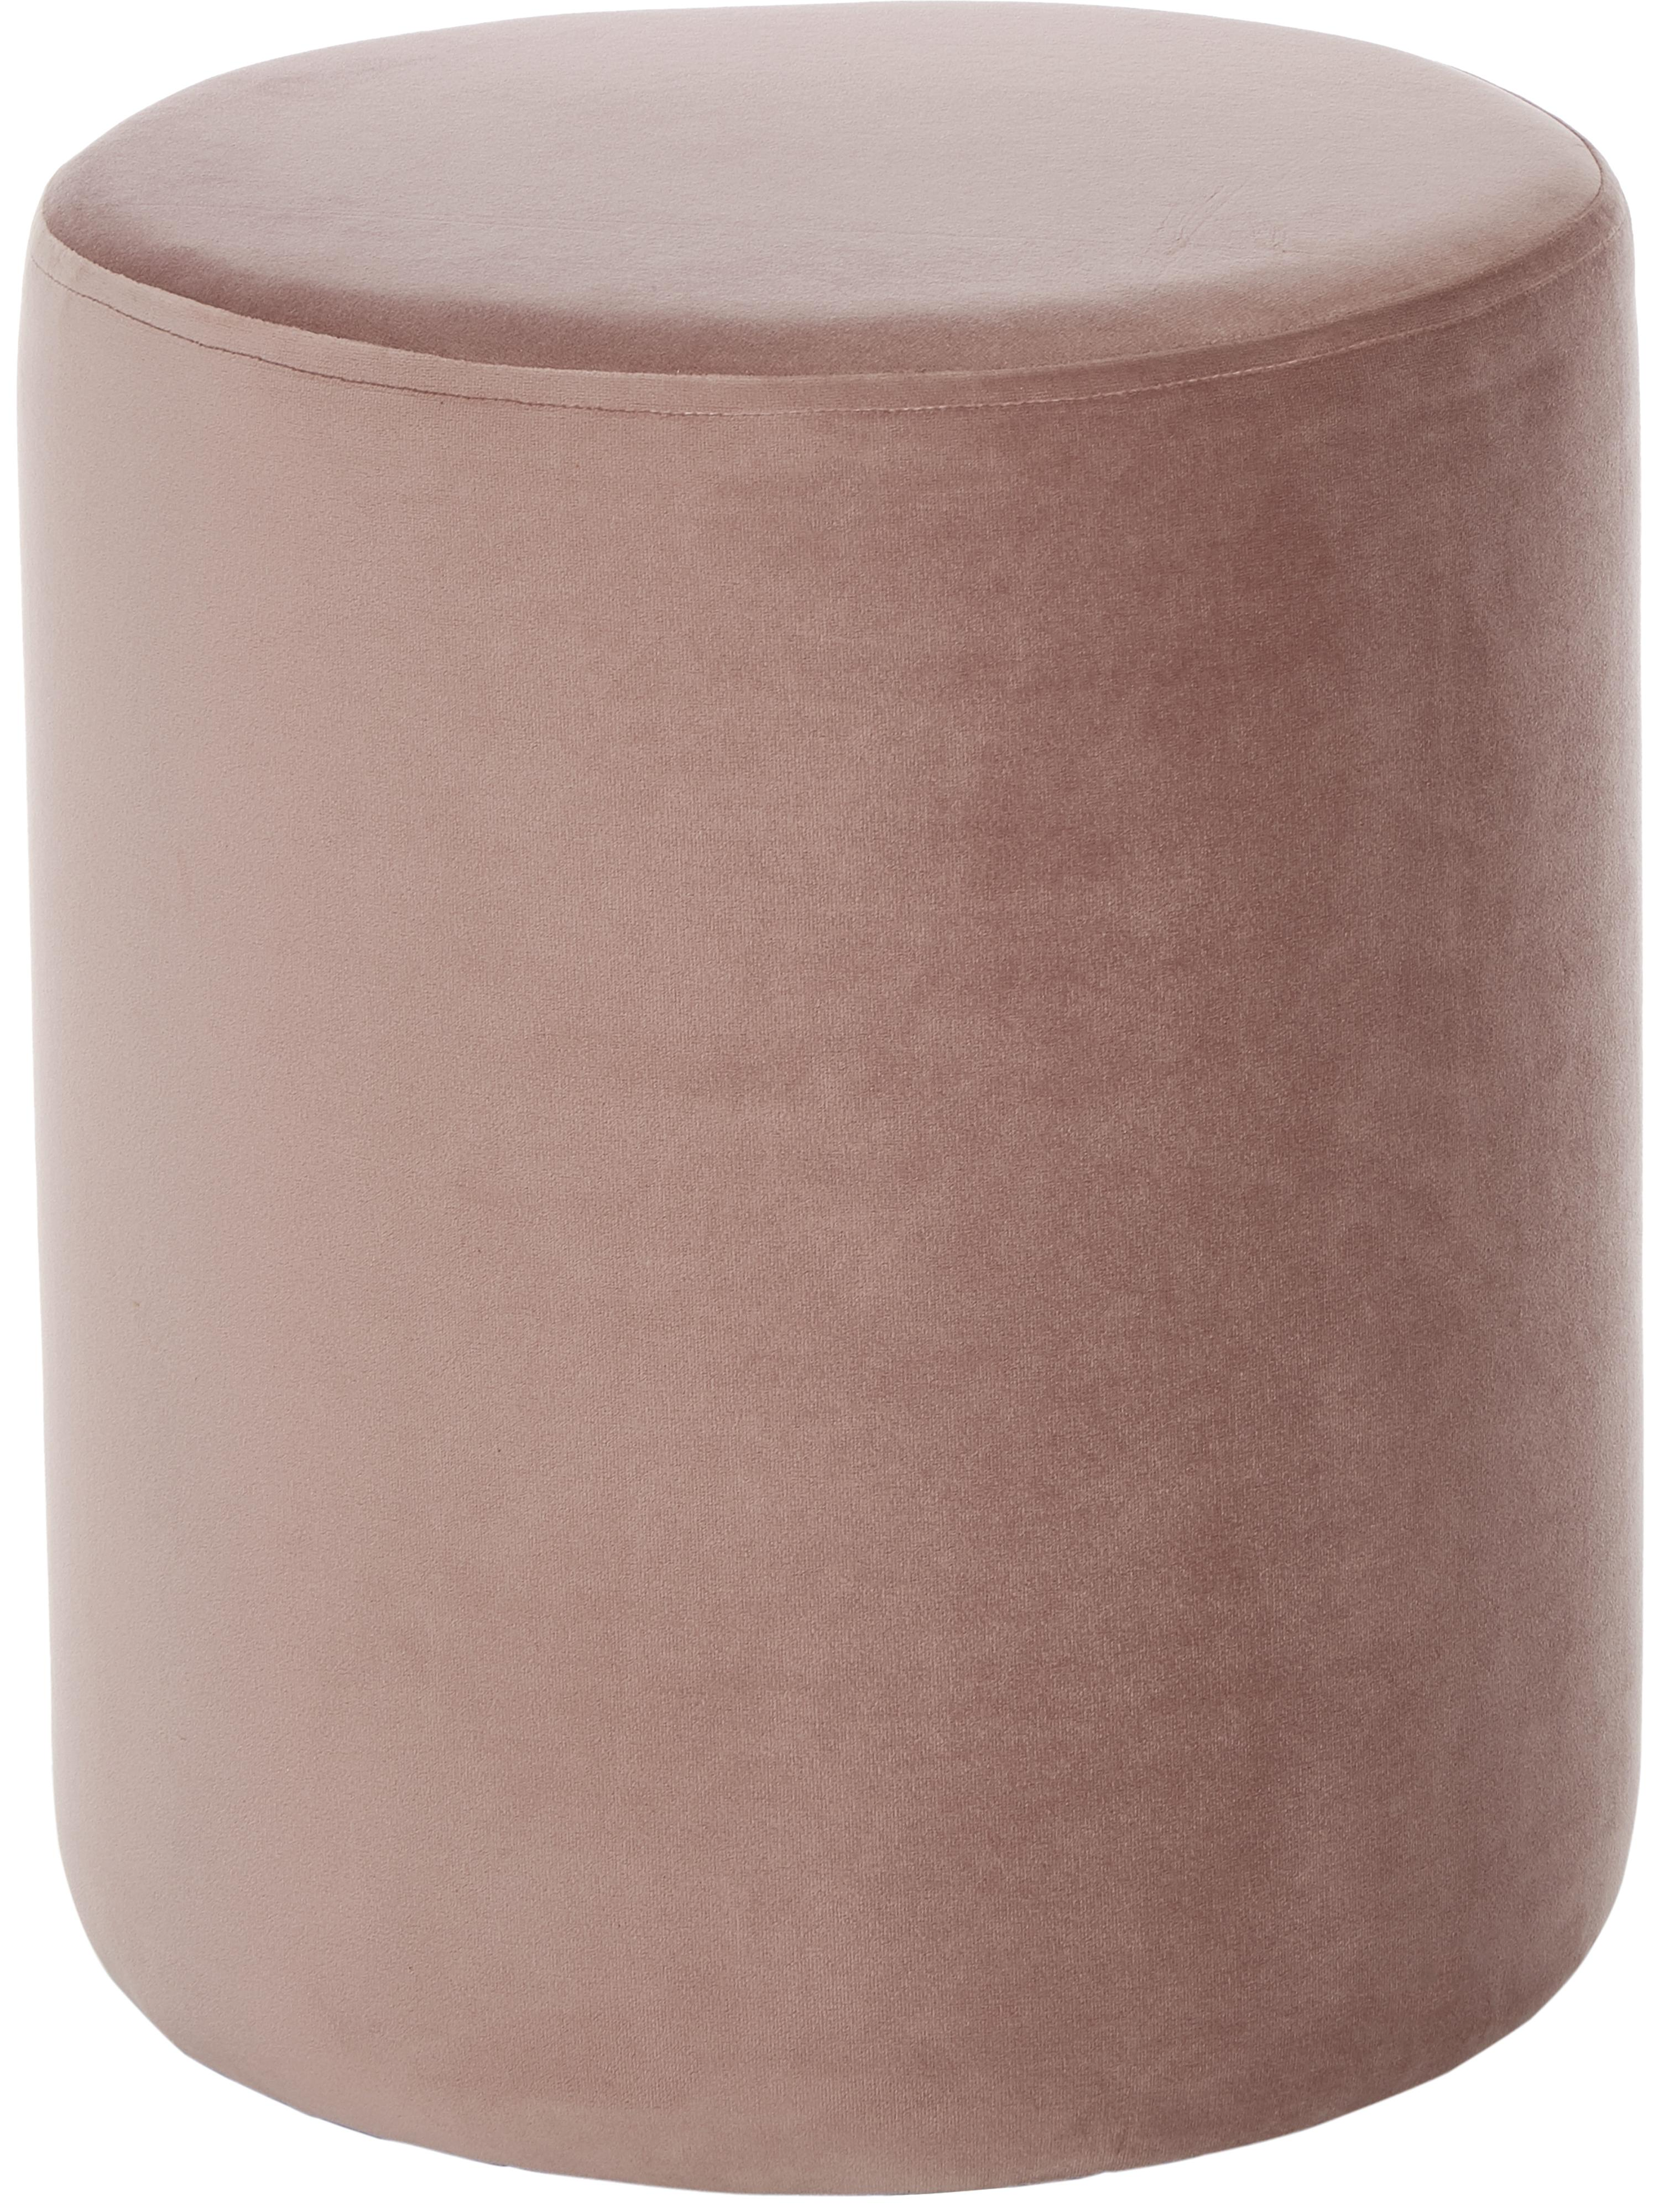 Samt-Hocker Daisy, Bezug: Samt (Polyester) 25.000 S, Rahmen: Sperrholz, Samt Rosa, ∅ 38 x H 45 cm